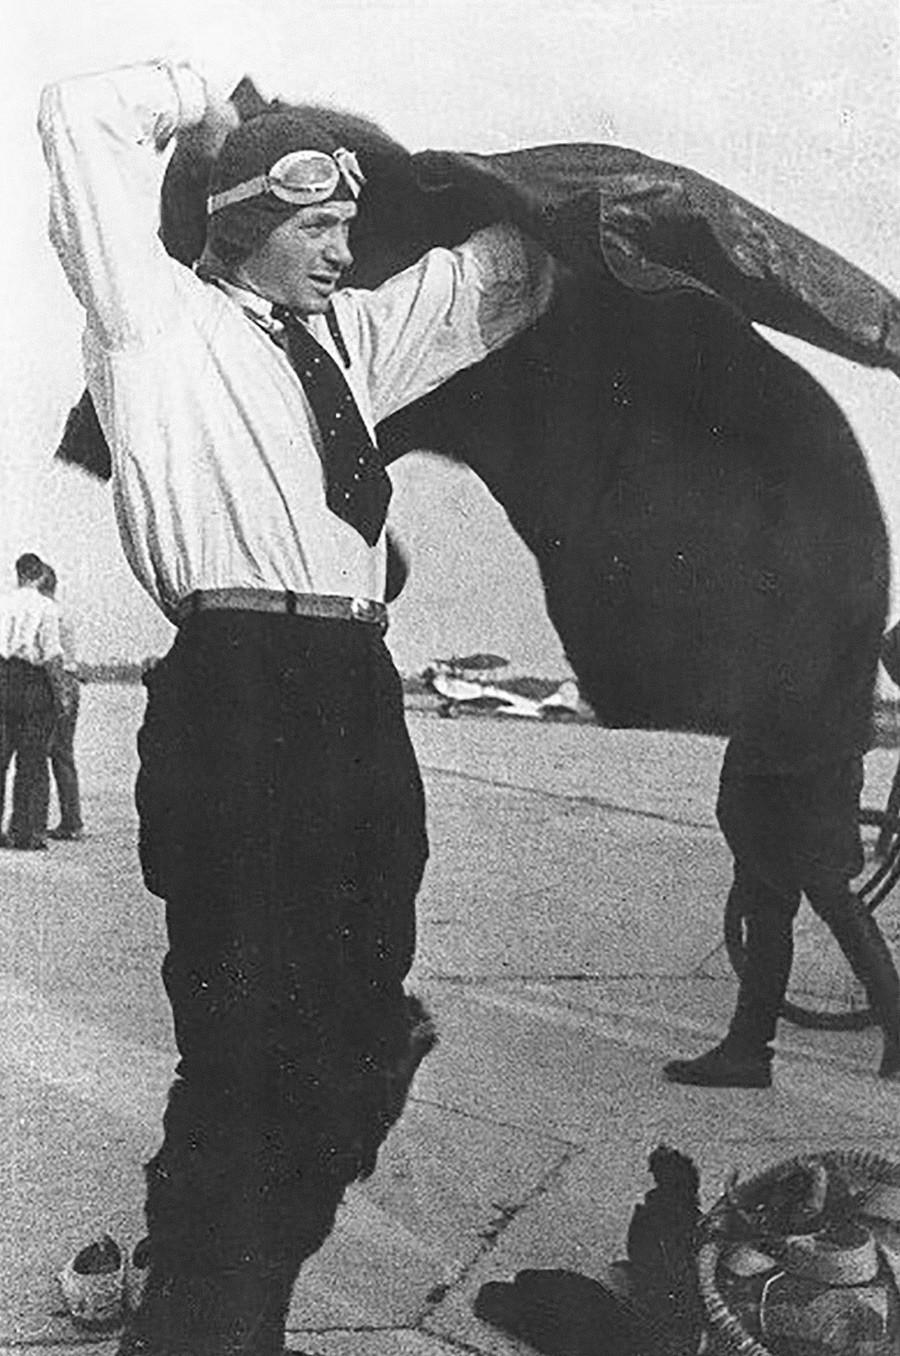 Pilot uji coba Vladimir Kokkinaki tengah bersiap sebelum terbang, 1930-an.